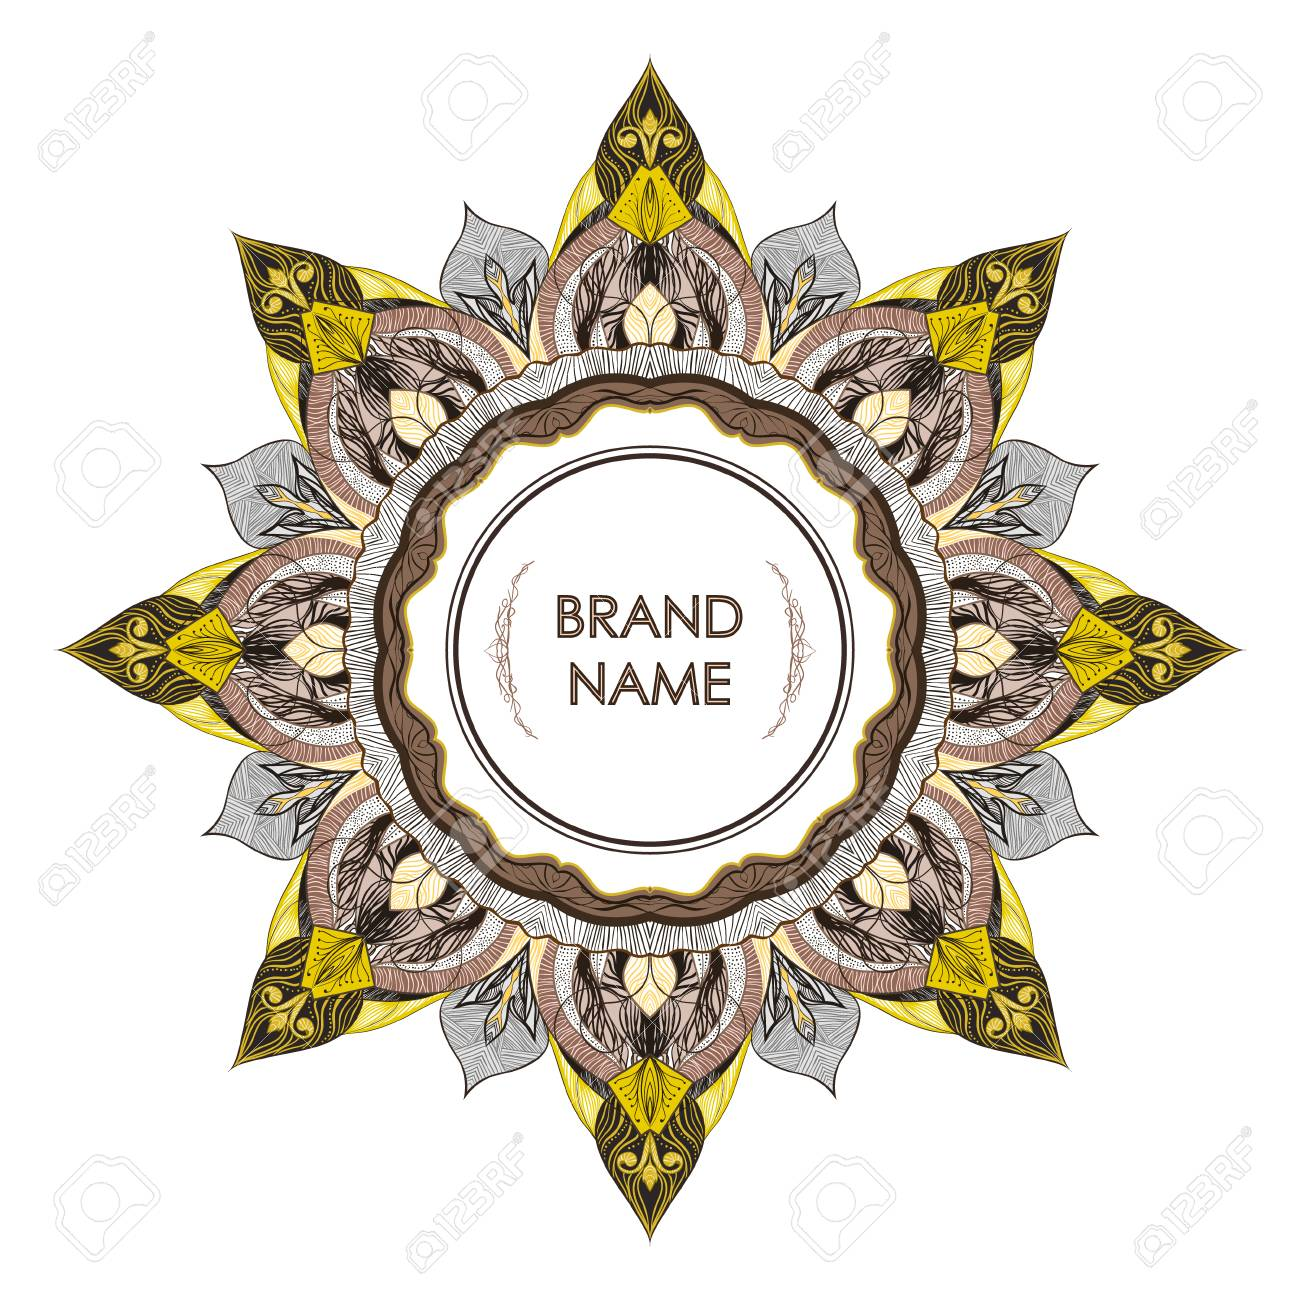 Vintage symmetrical decorative frame for text. Floral filigree detailing elegant style of drawing - empty space for brand name. Printing on envelopes, premium invitation, glasses, business card, stamp - 104765115